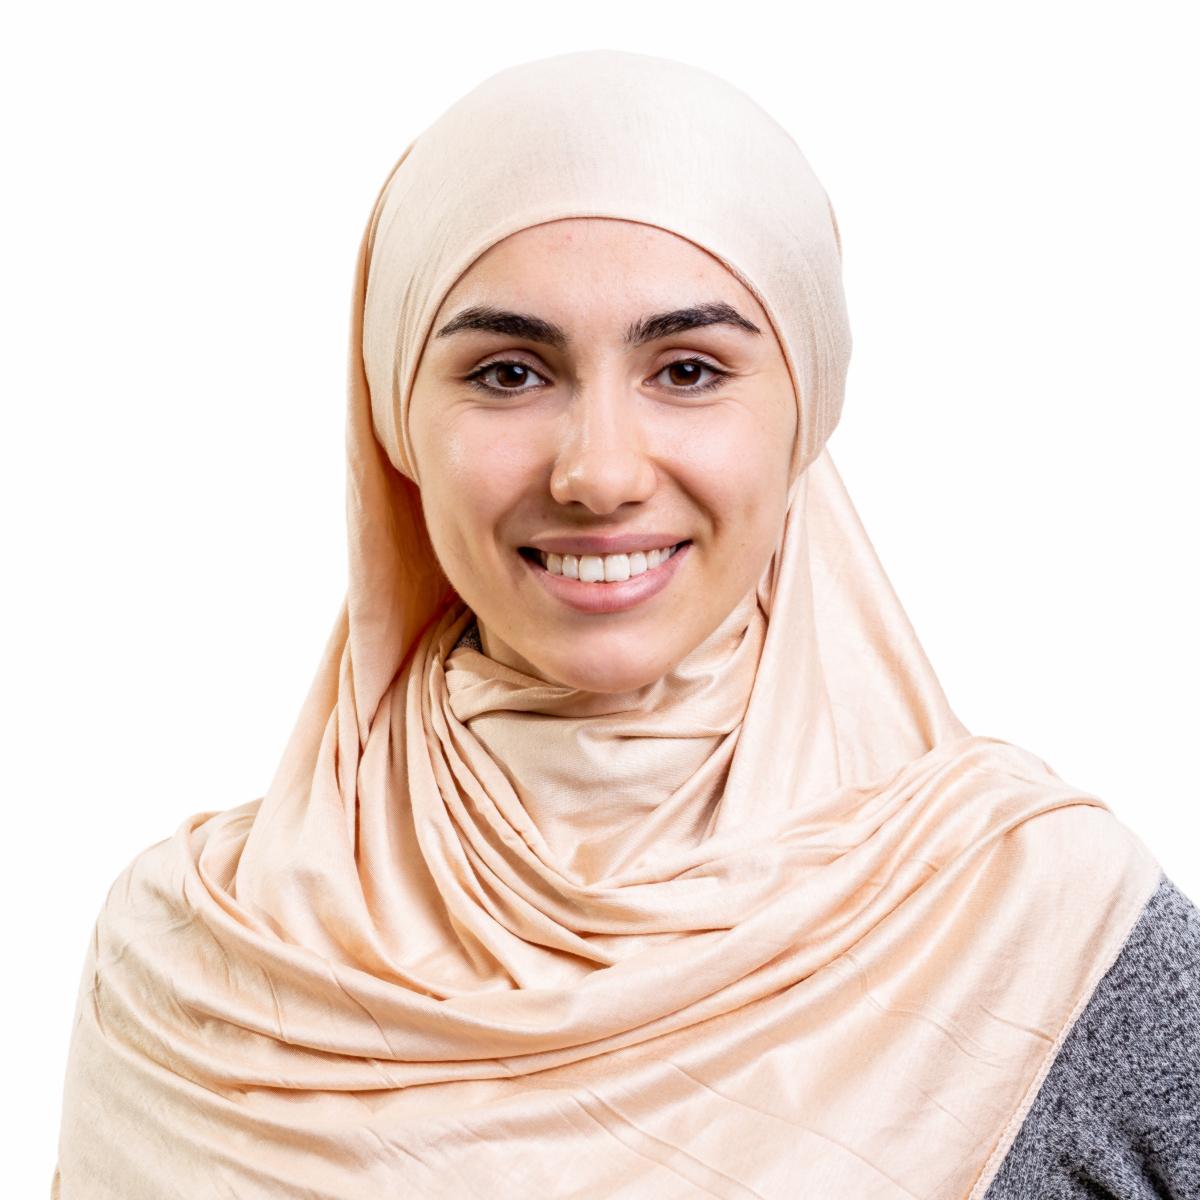 Хиджаб платок женский Asiyah AY-HJB3-01 светло-бежевый р. 170x60